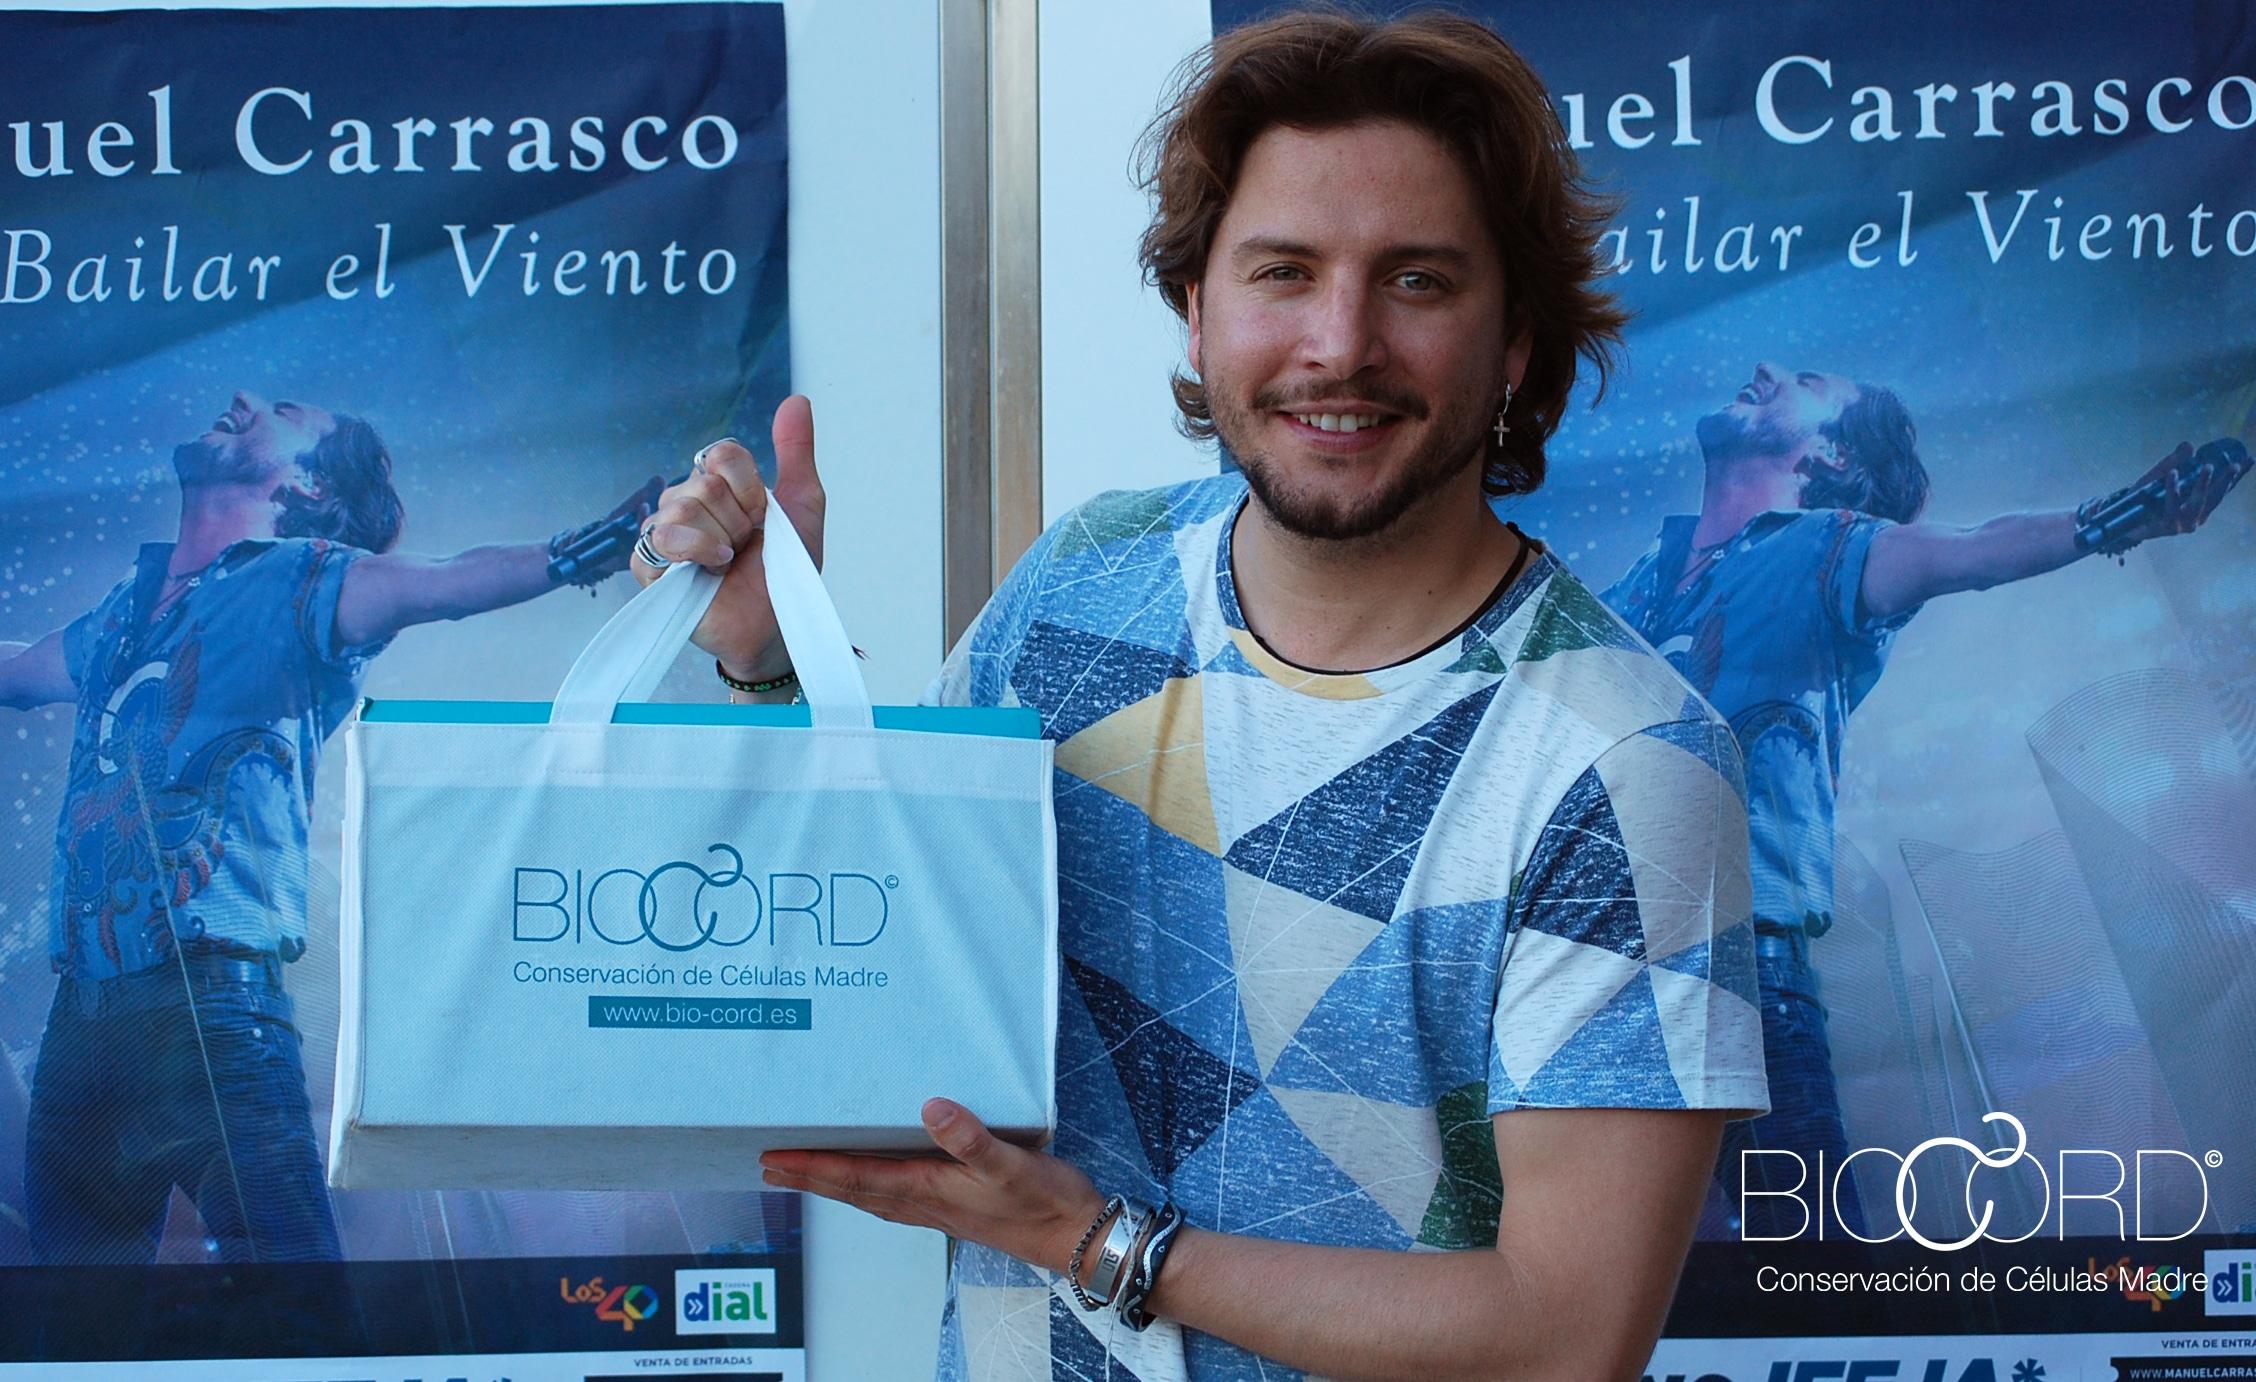 El cantante Manuel Carrasco recoge el kit de células madre de Bio-Cord